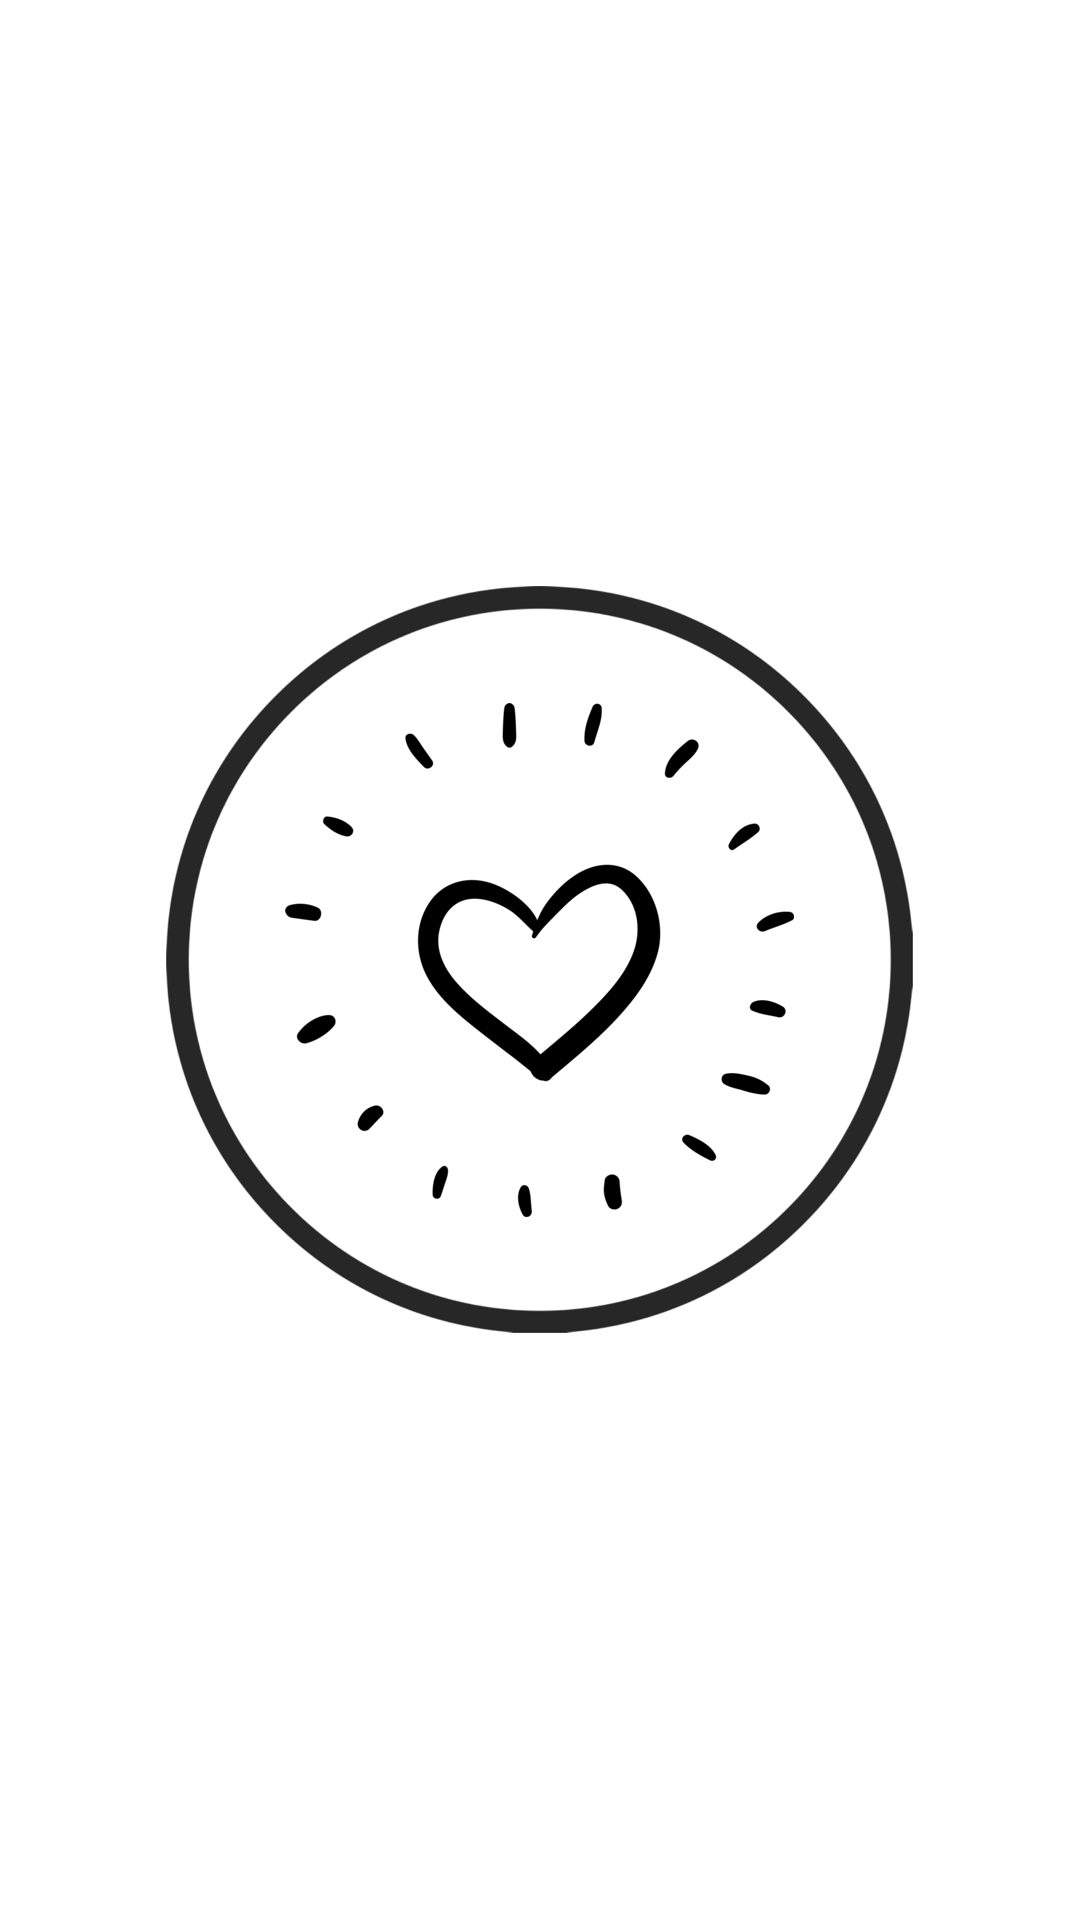 Instagram Highlight Cover Marriage Love Relationship White Minimalist Theme Iconos De Instagram Icono De Instagram Iconos